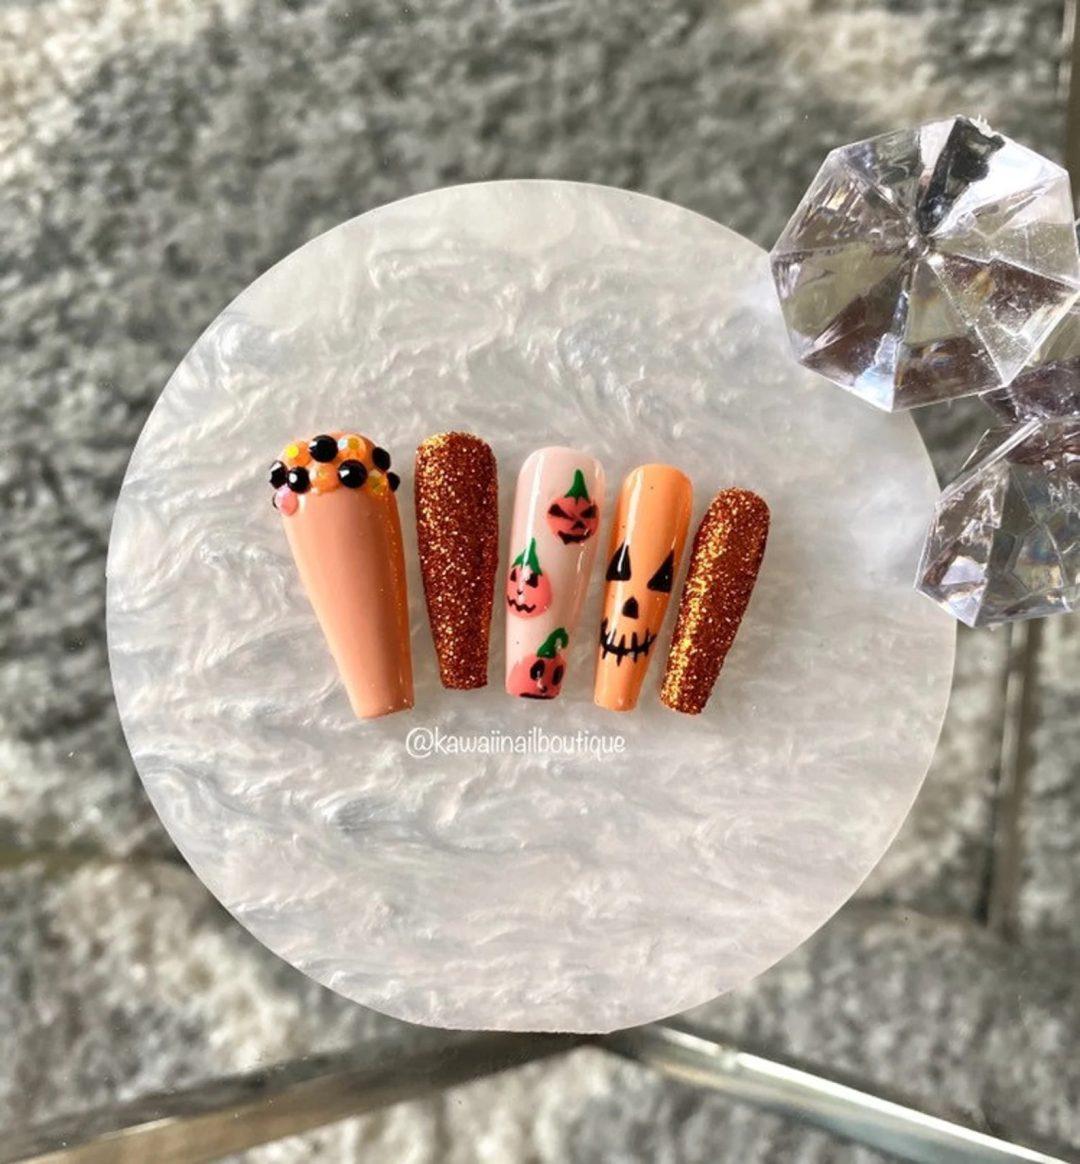 Burnt Orange Pumpkins with glitter and decals